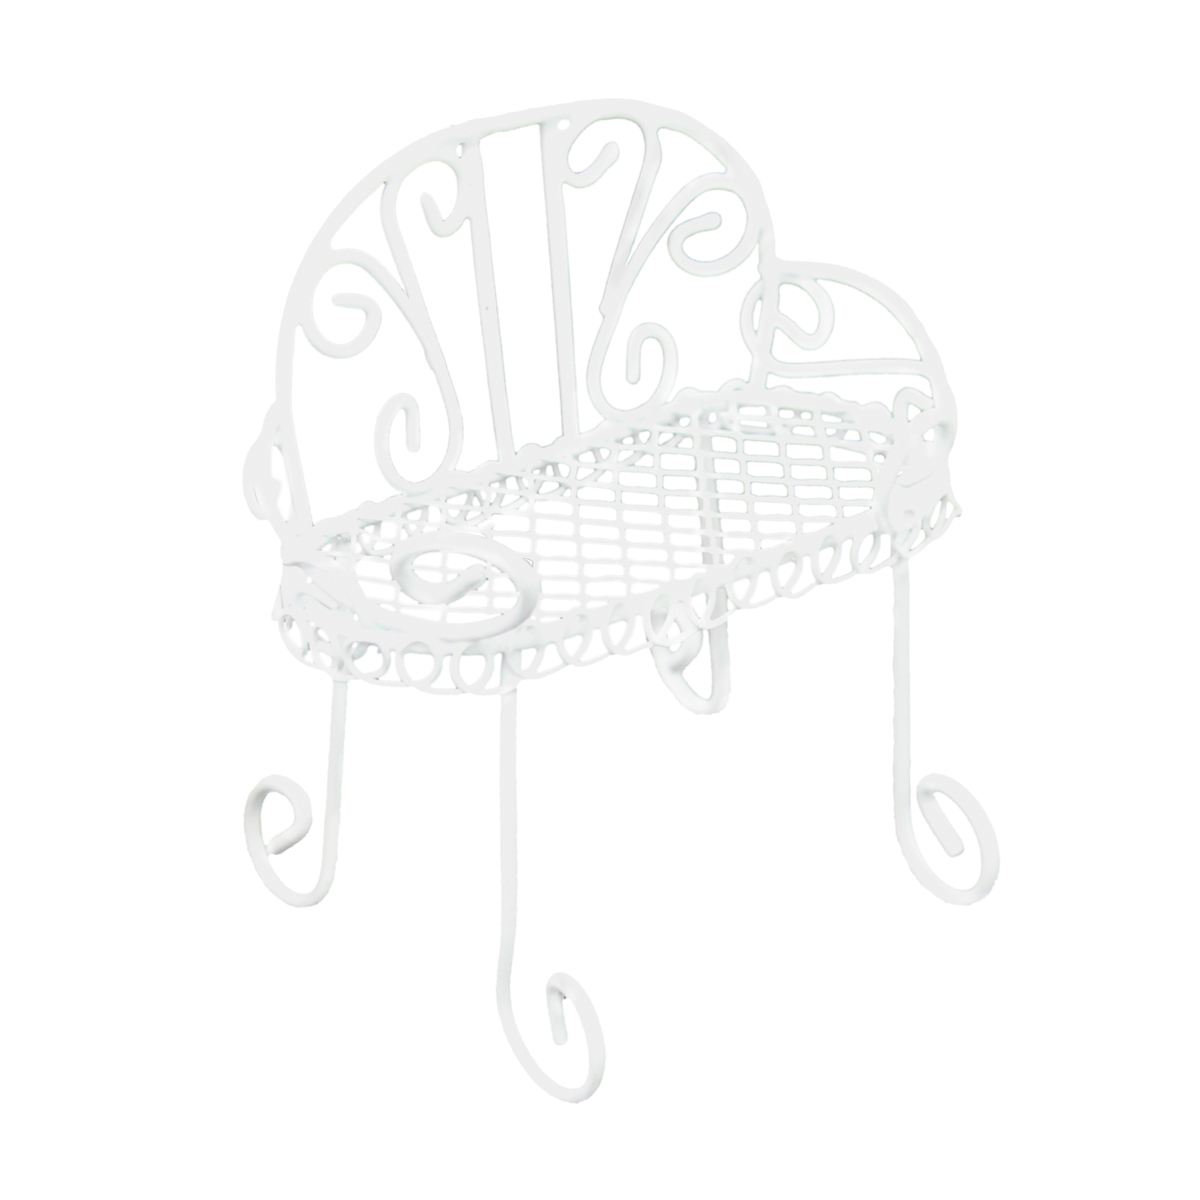 KB3135 Металлический мини стул, белый 8,7*4*7,5см Астра